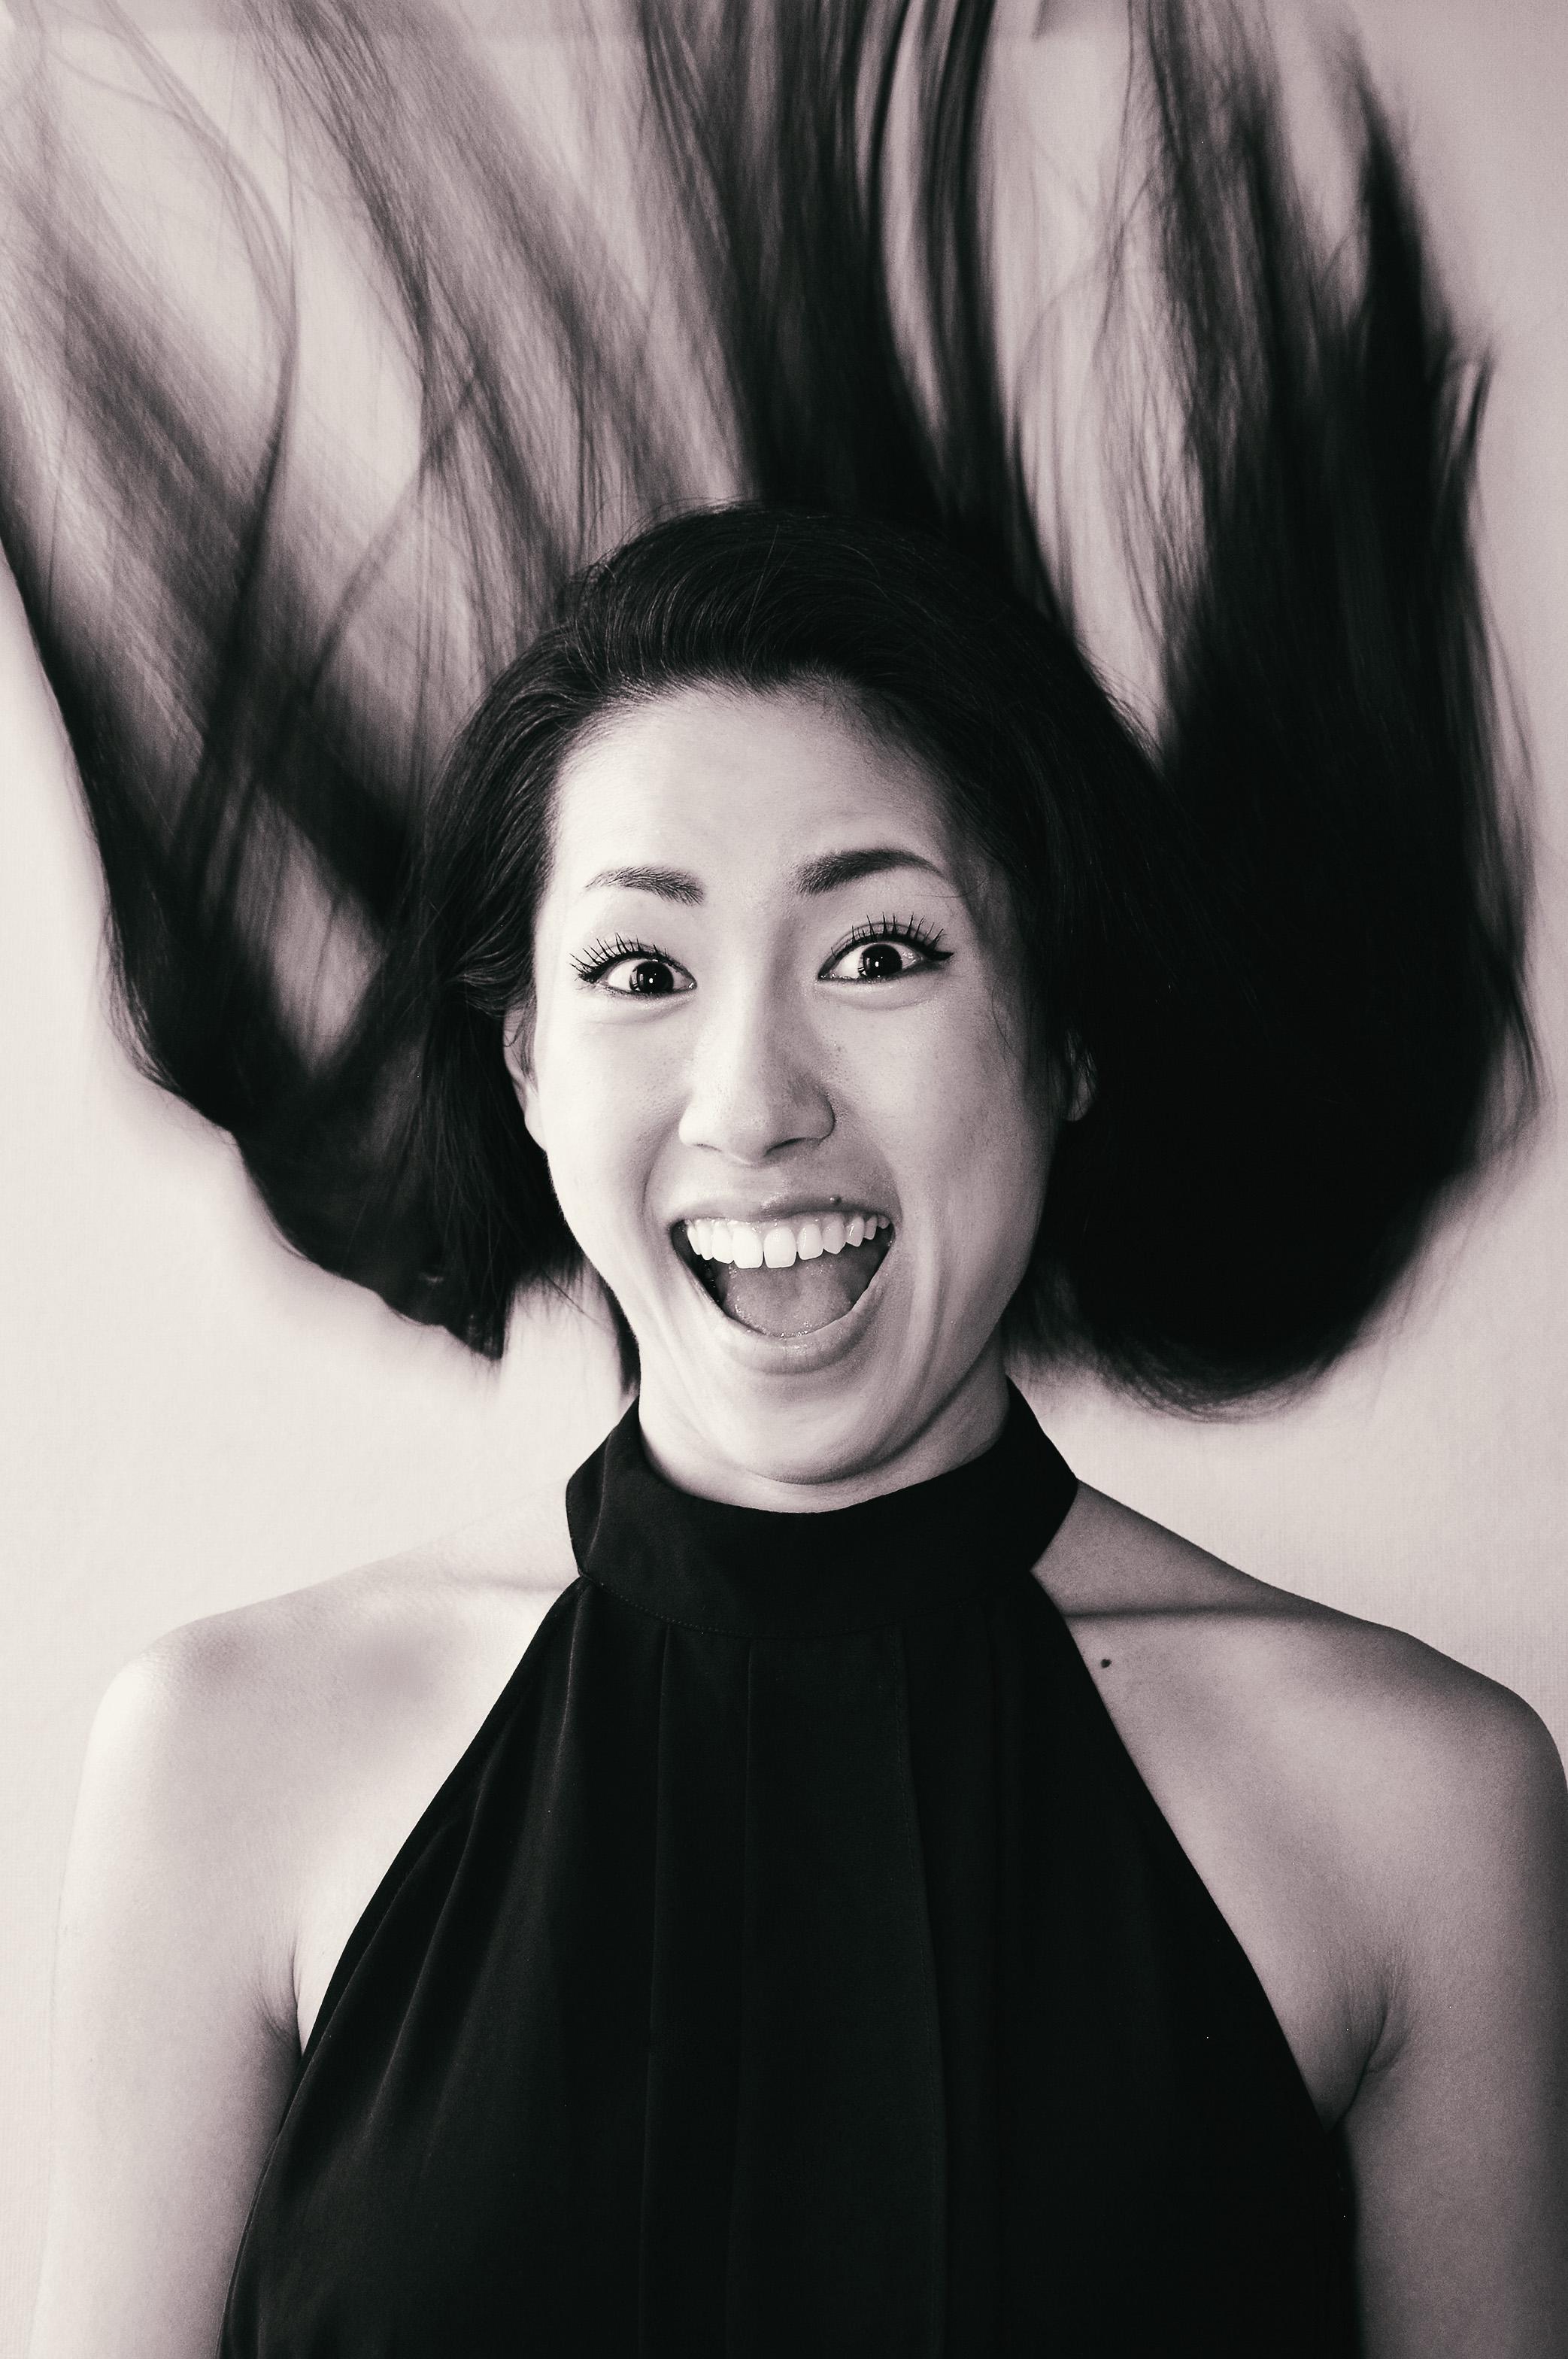 Popura Nakayama - Actress (NYC)